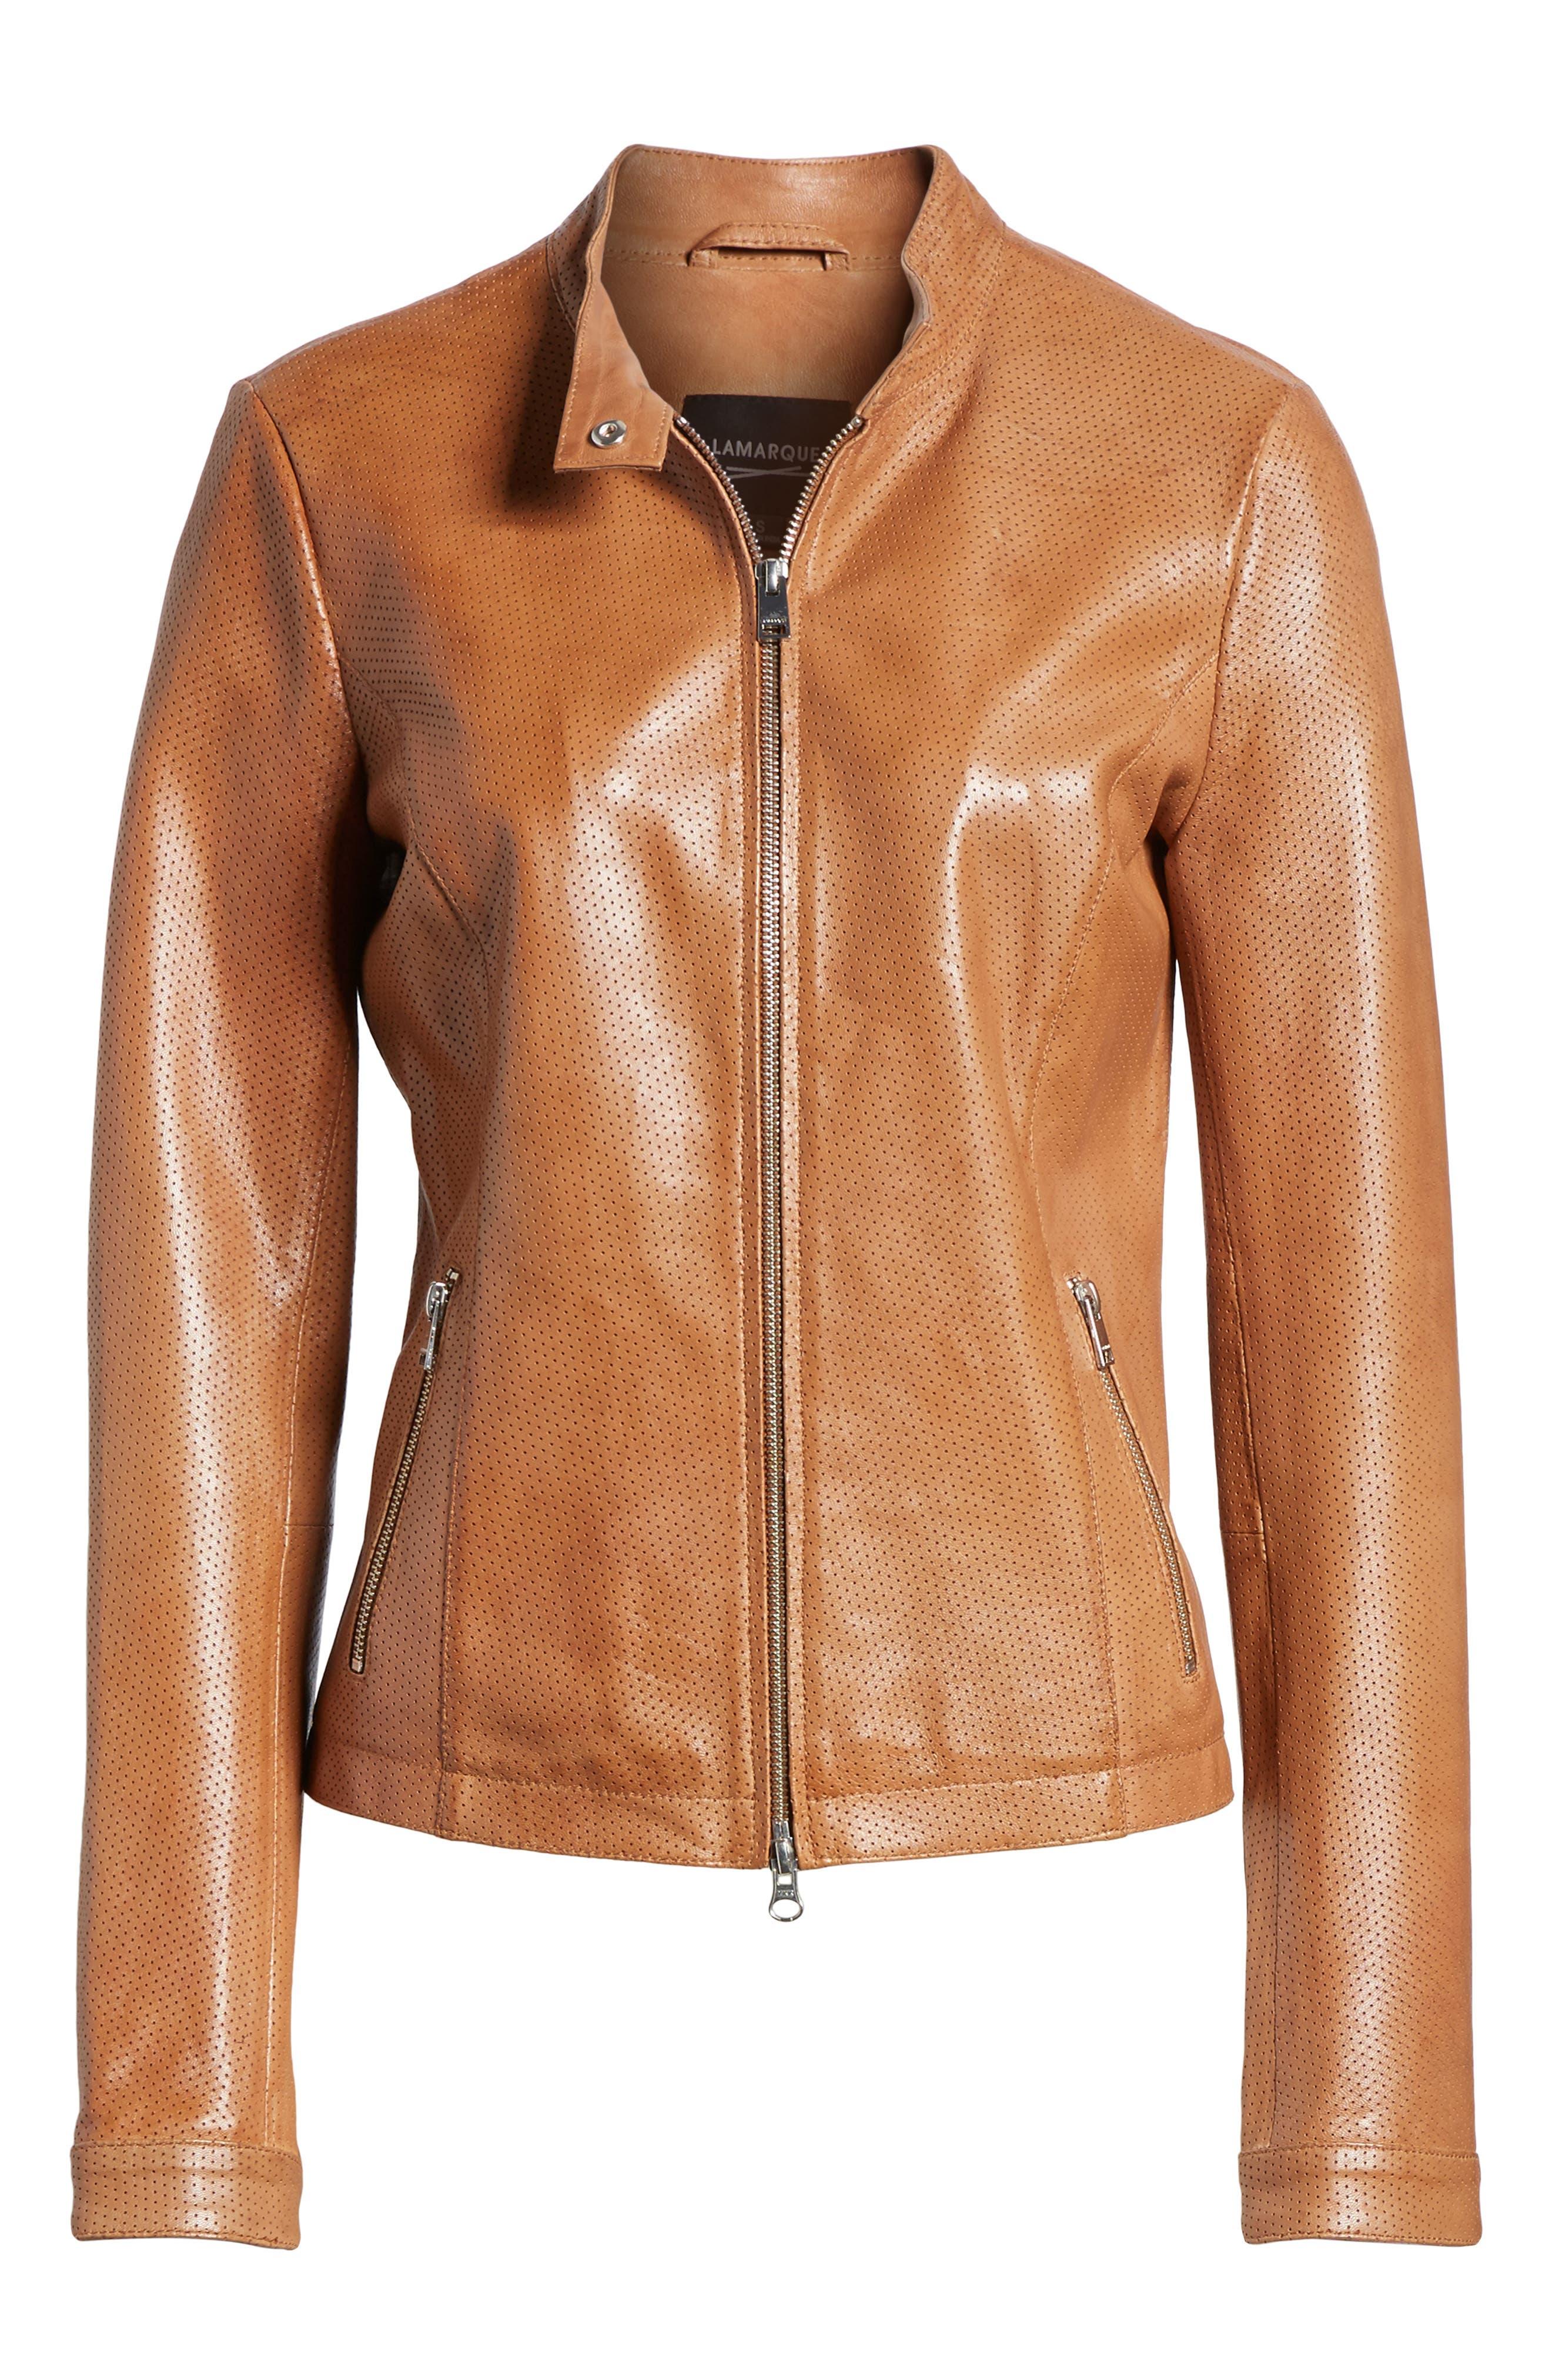 Perforated Leather Biker Jacket,                             Alternate thumbnail 7, color,                             Tan